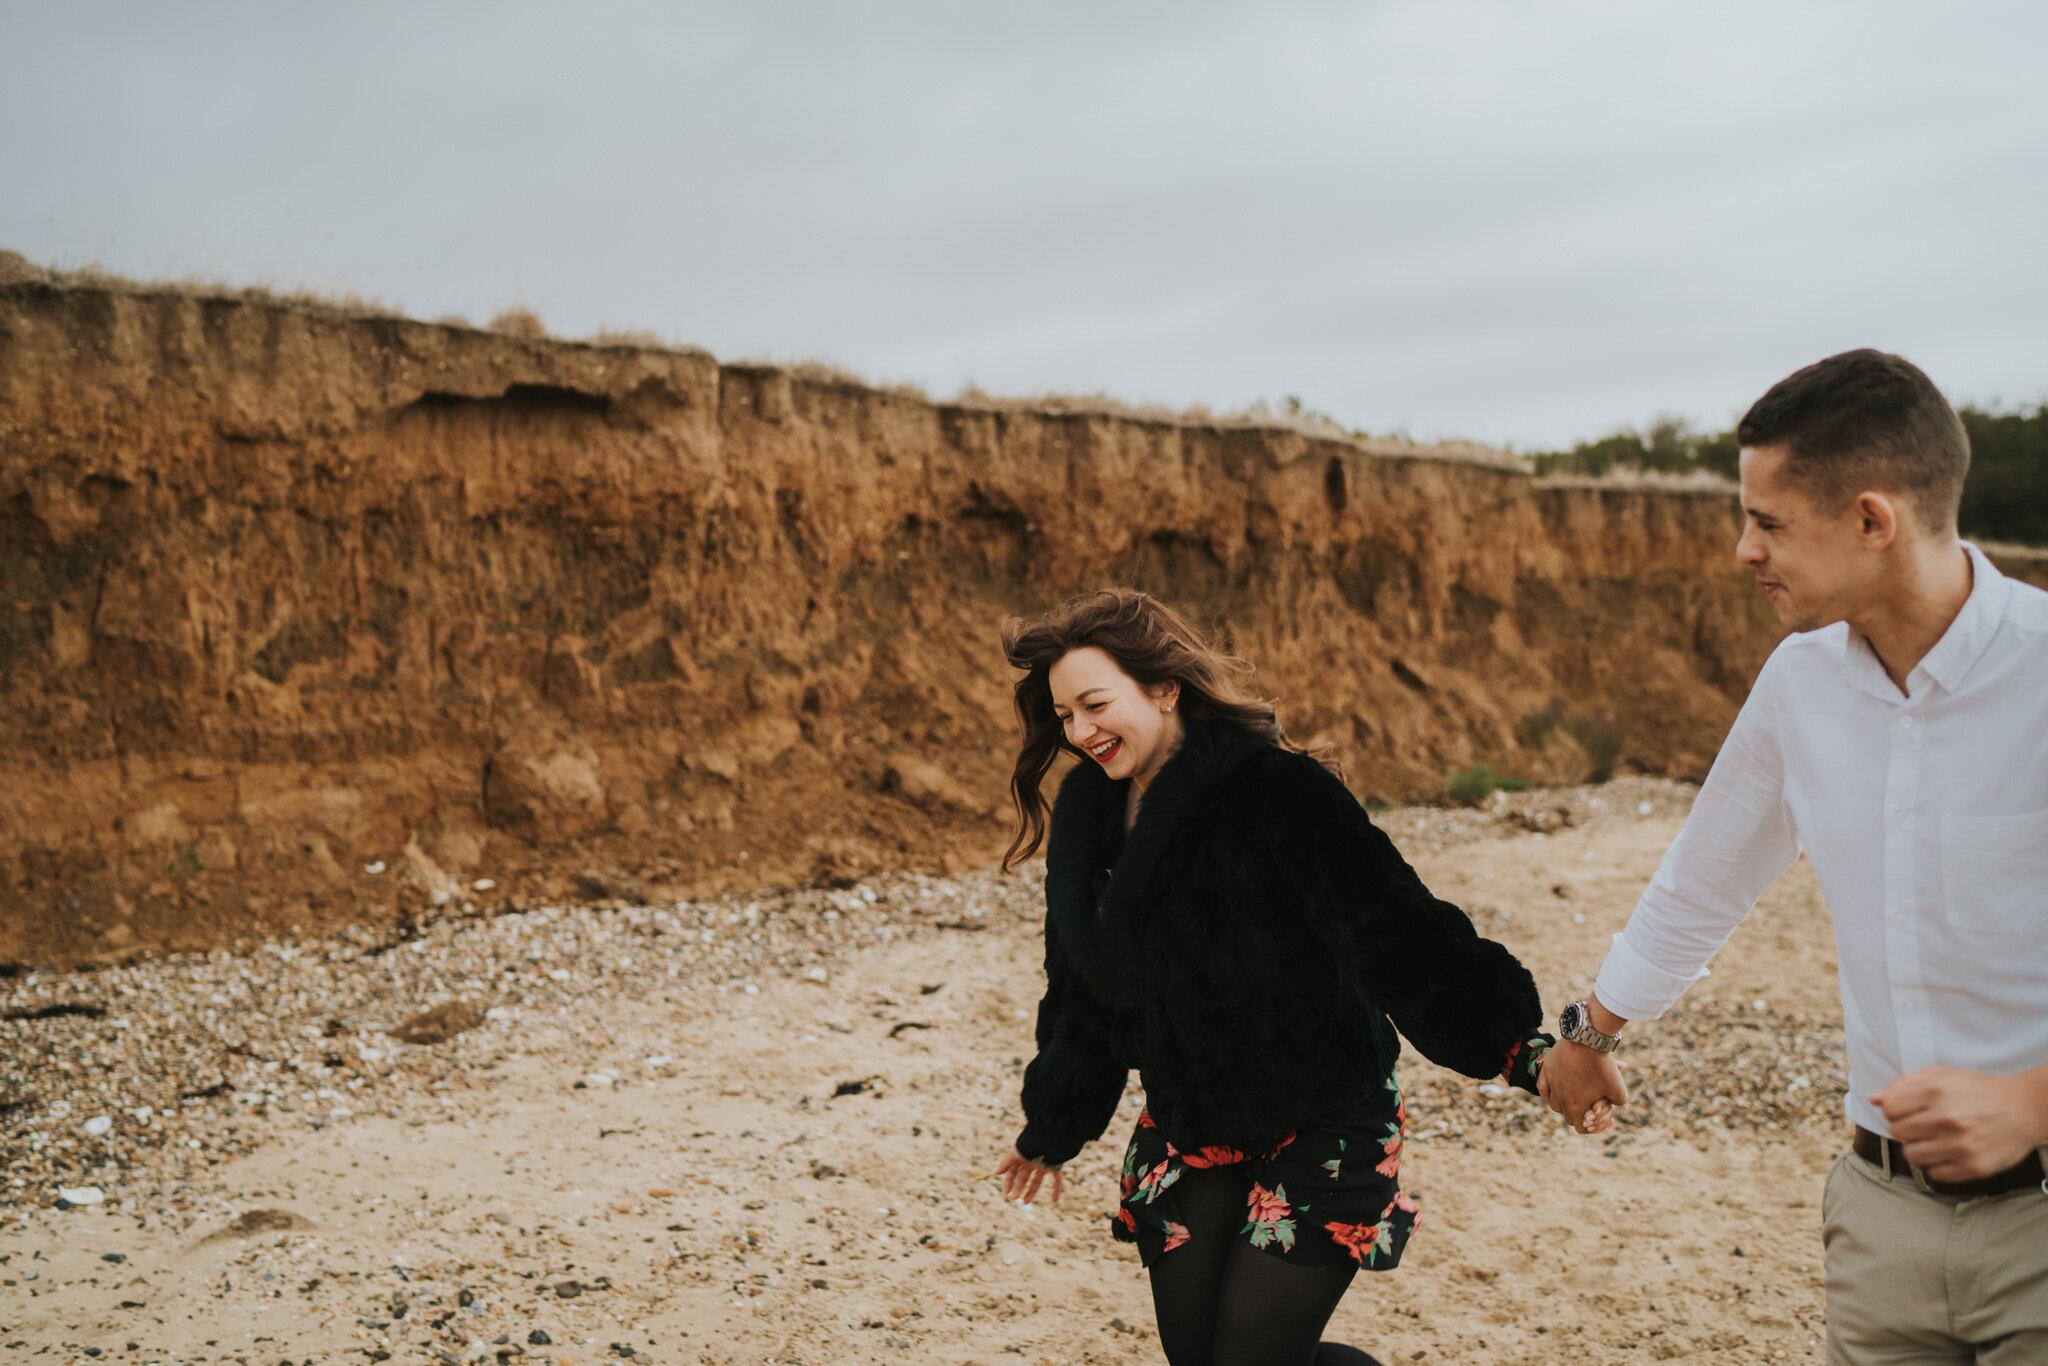 engagement-pre-wedding-hannah-michael-cudmore-grove-east-mersea-grace-elizabeth-colchester-essex-devon-suffolk-and-norfolk-alternative-wedding-and-family-photographer (36 of 51).jpg